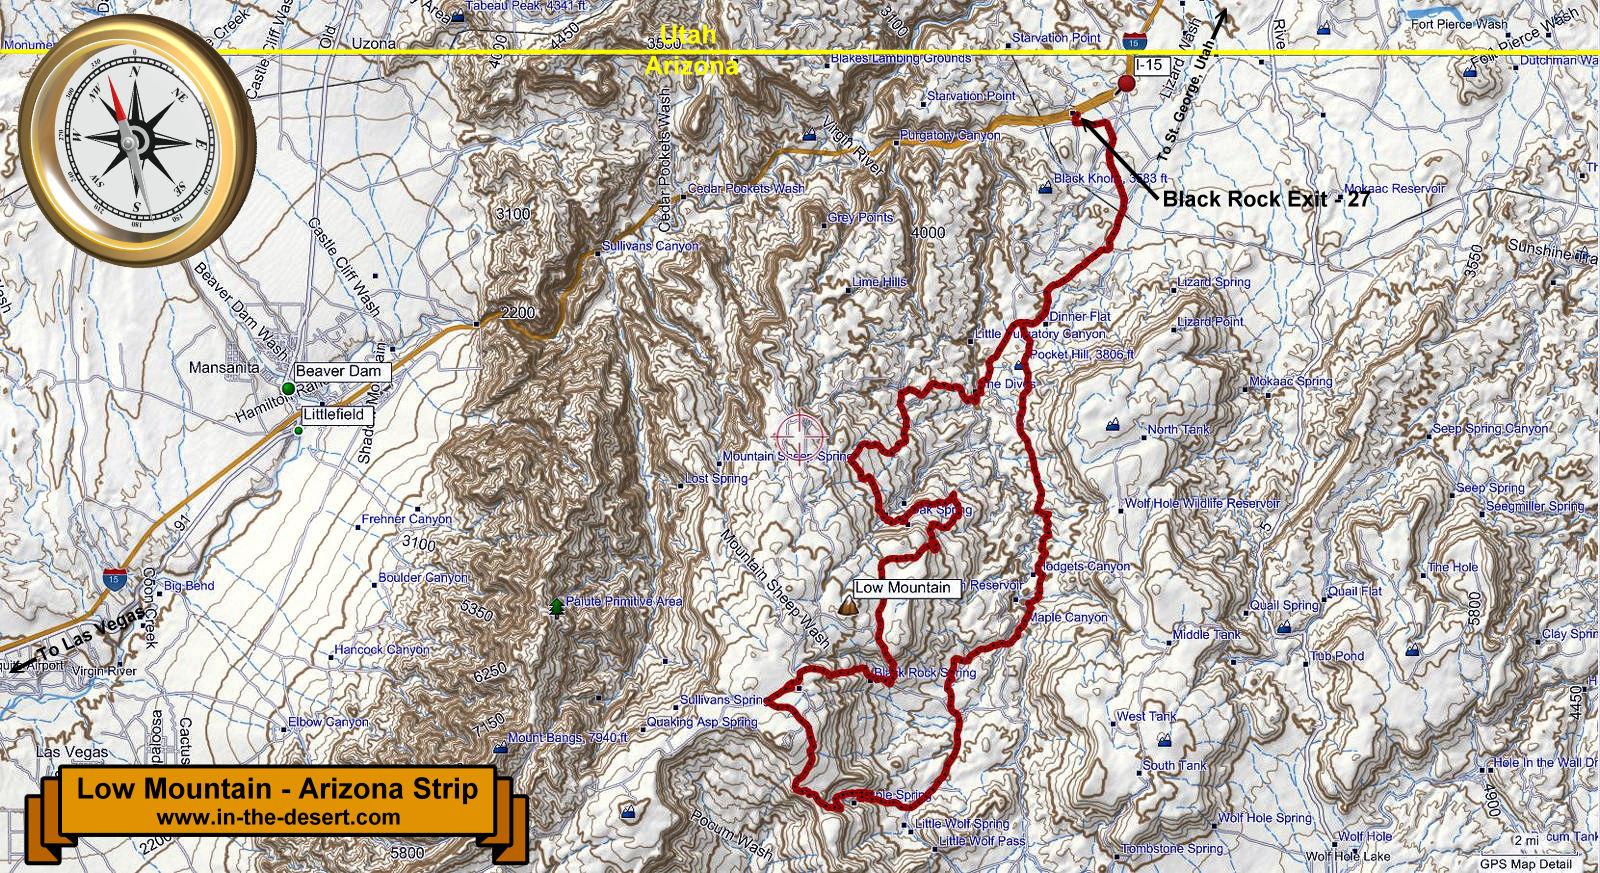 Map Of Arizona Strip.Interesting Trip In The Desert To The Arizona Strip